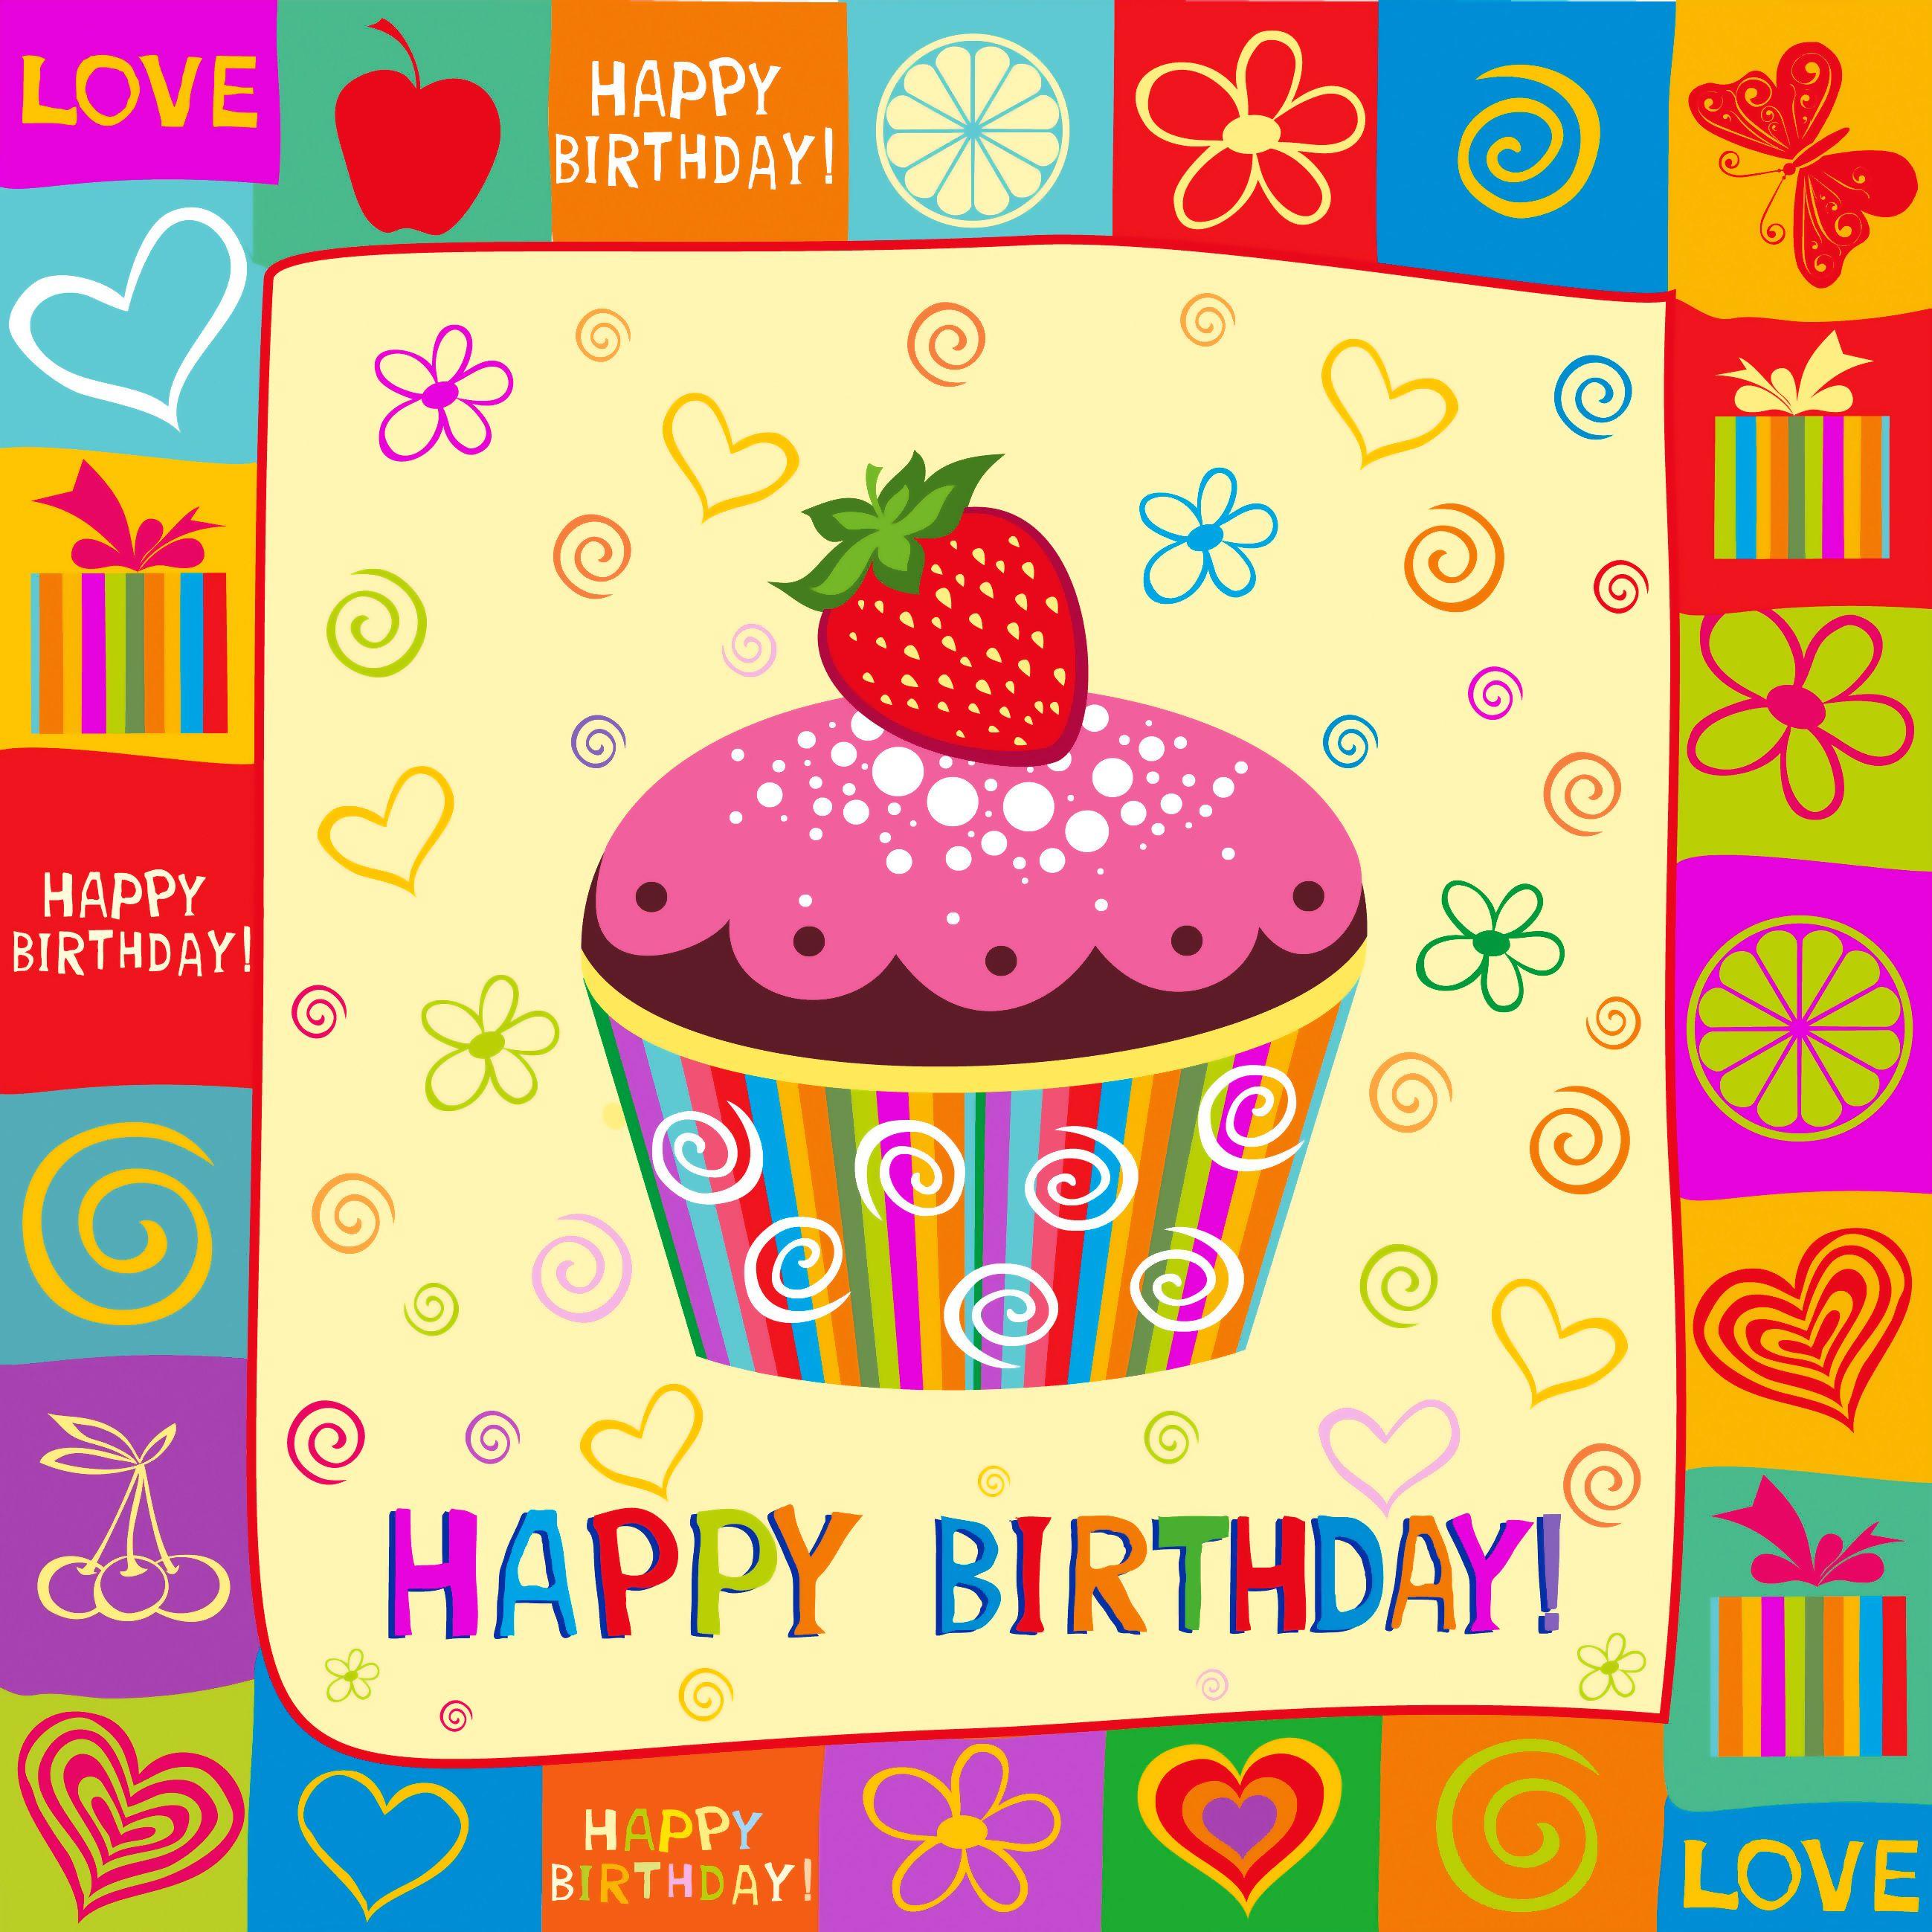 Картинки поздравления happy birthday